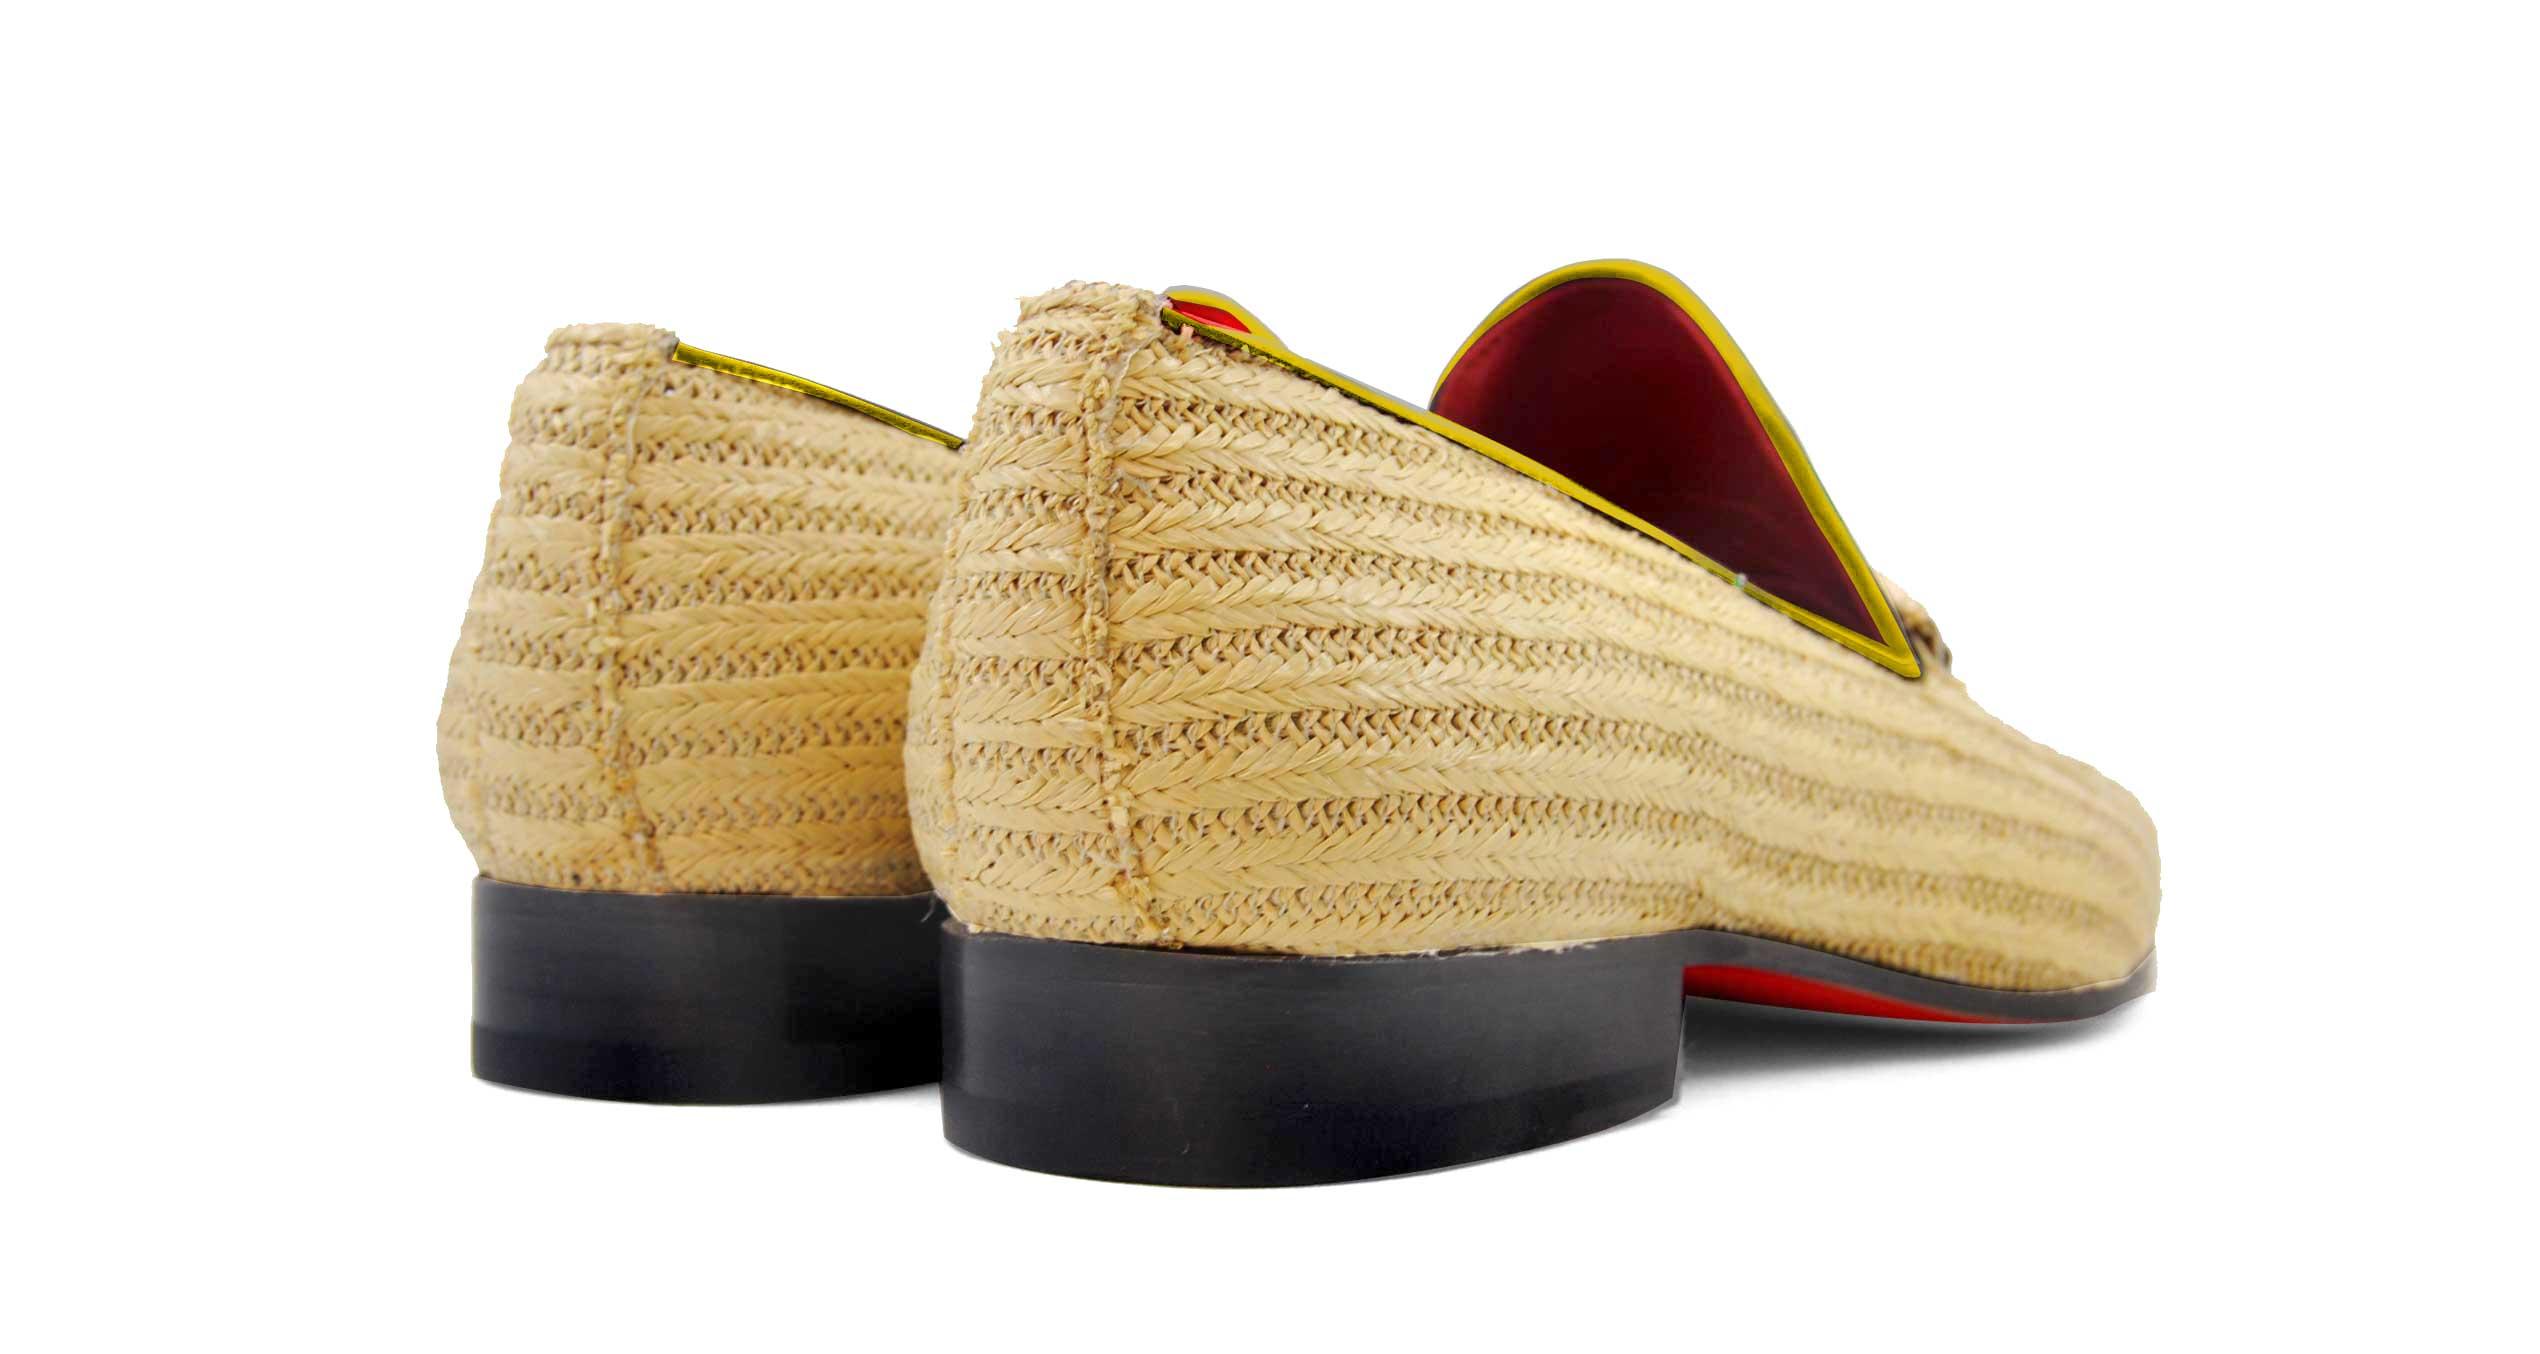 Foto 4 de Zapatos Palma Panameña Con Ribete Amarillo